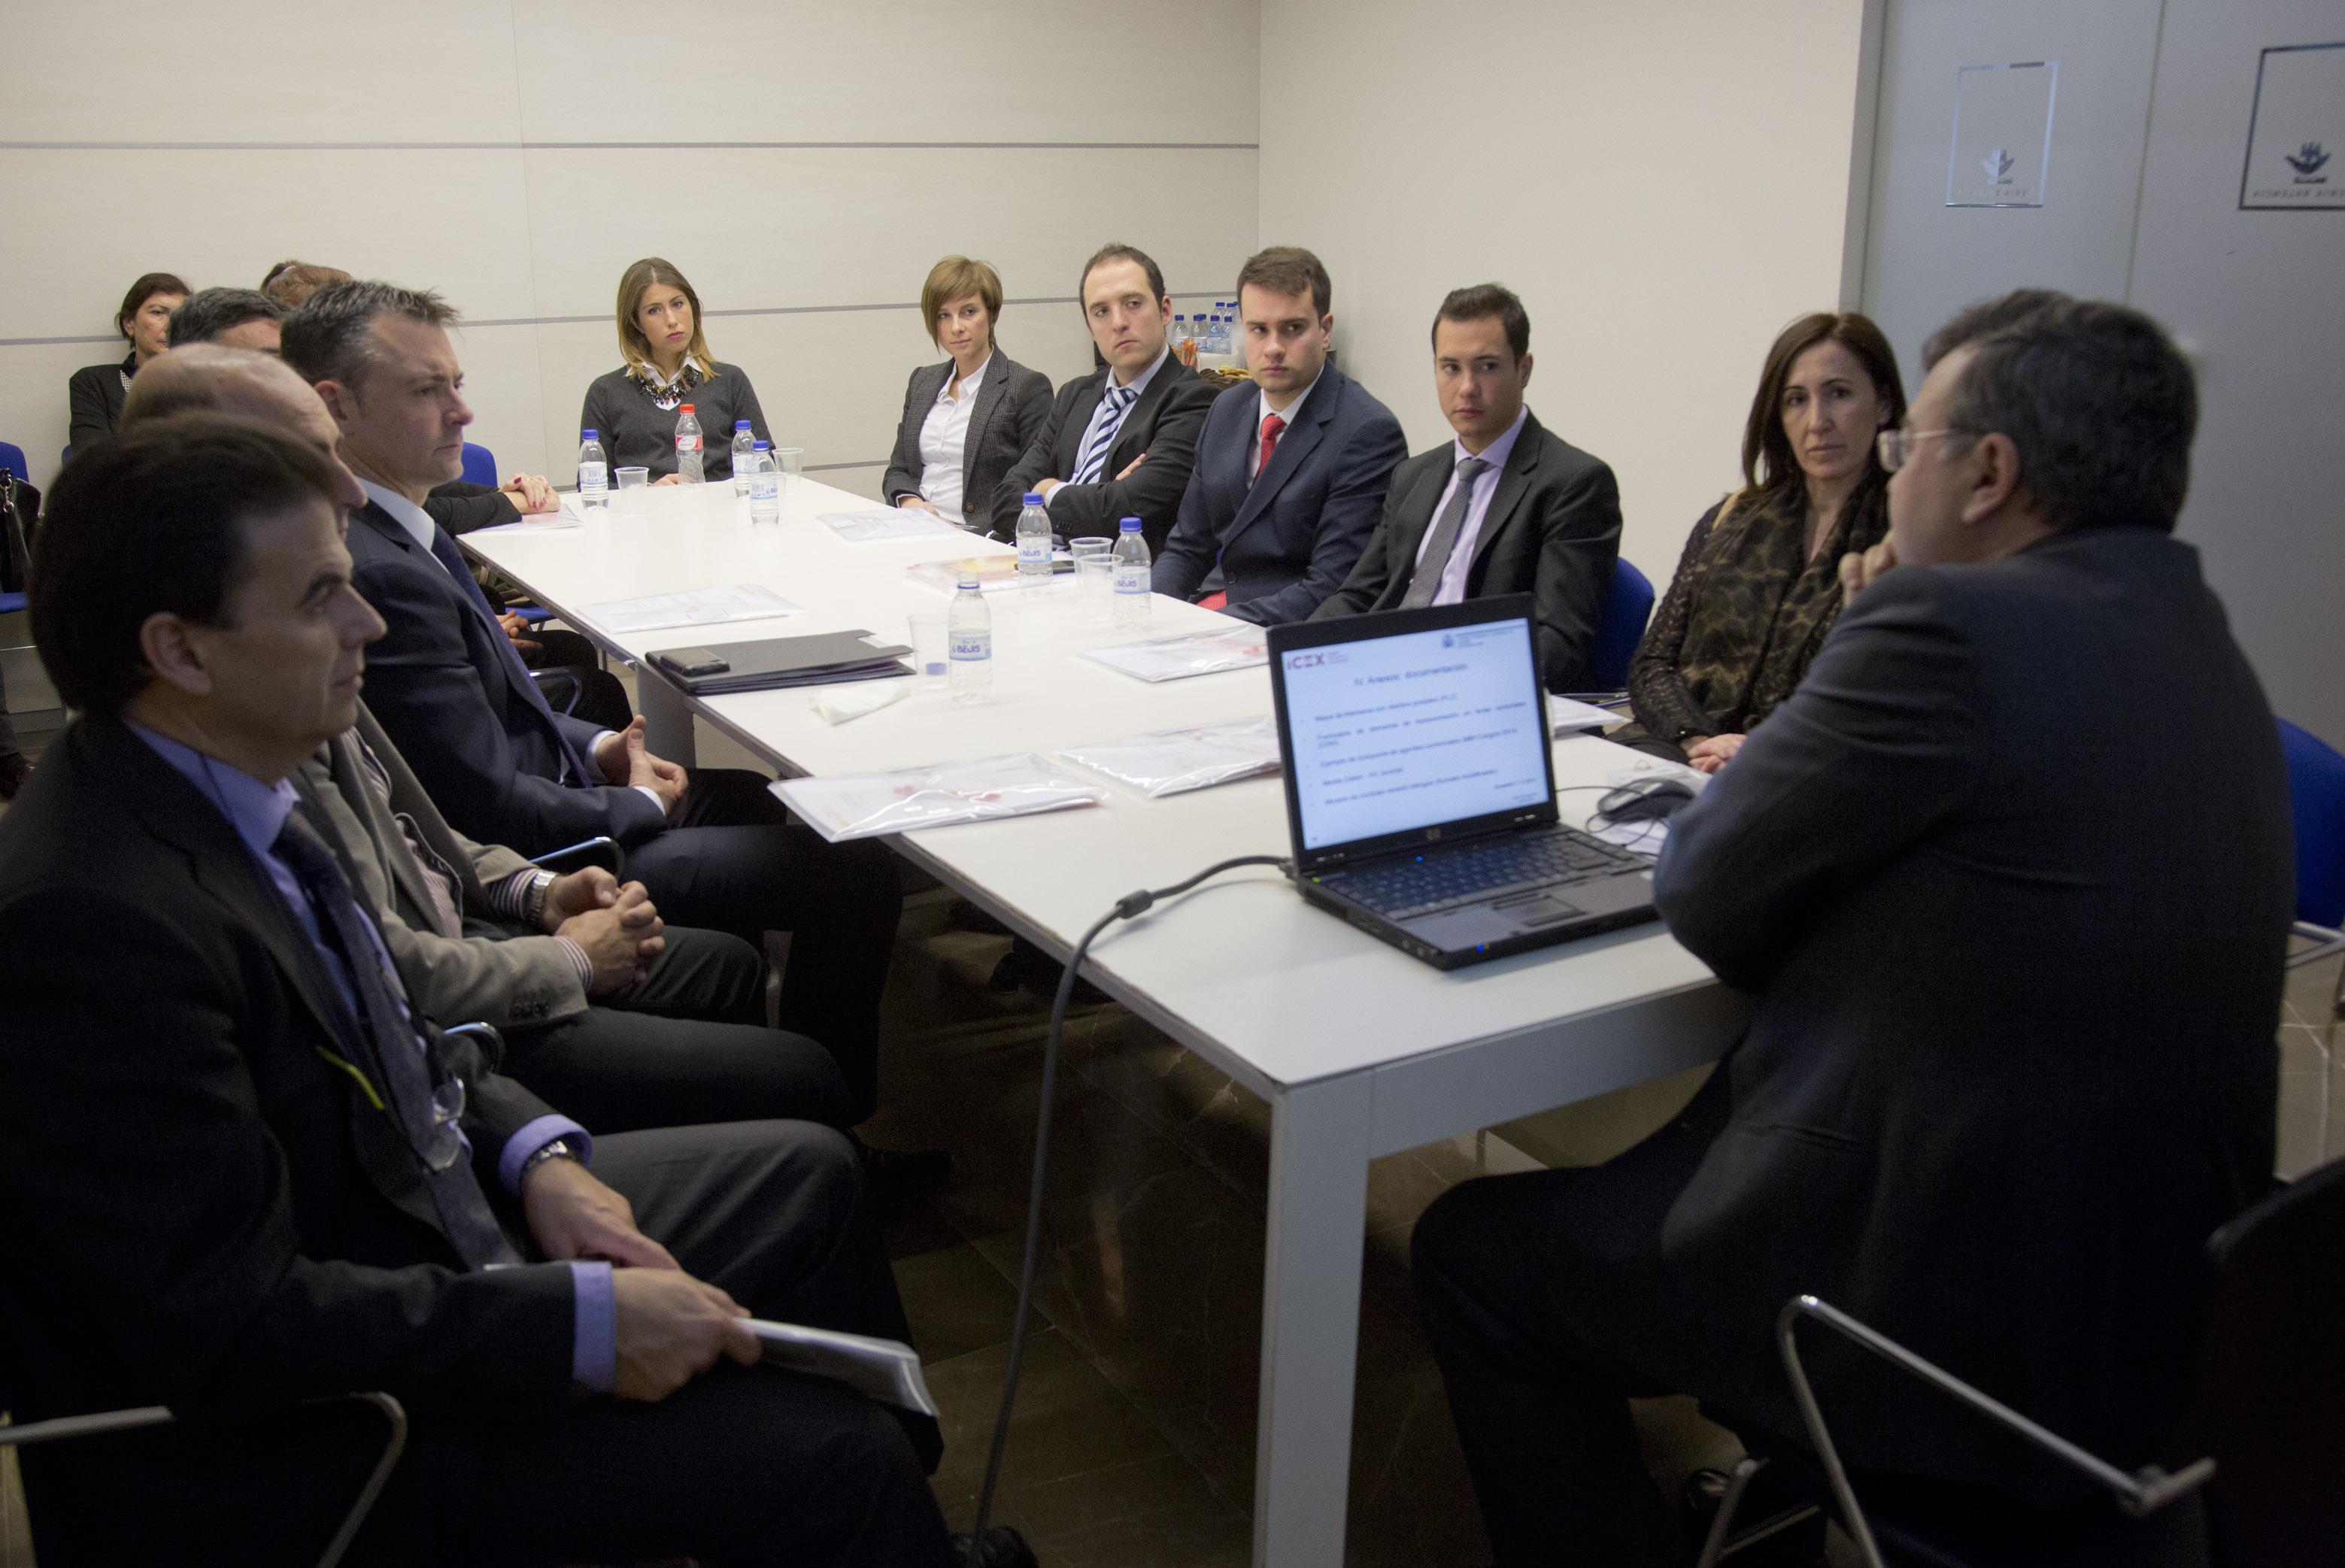 Masiva afluencia de compradores internacionales a feria for Oficina consumidor valencia